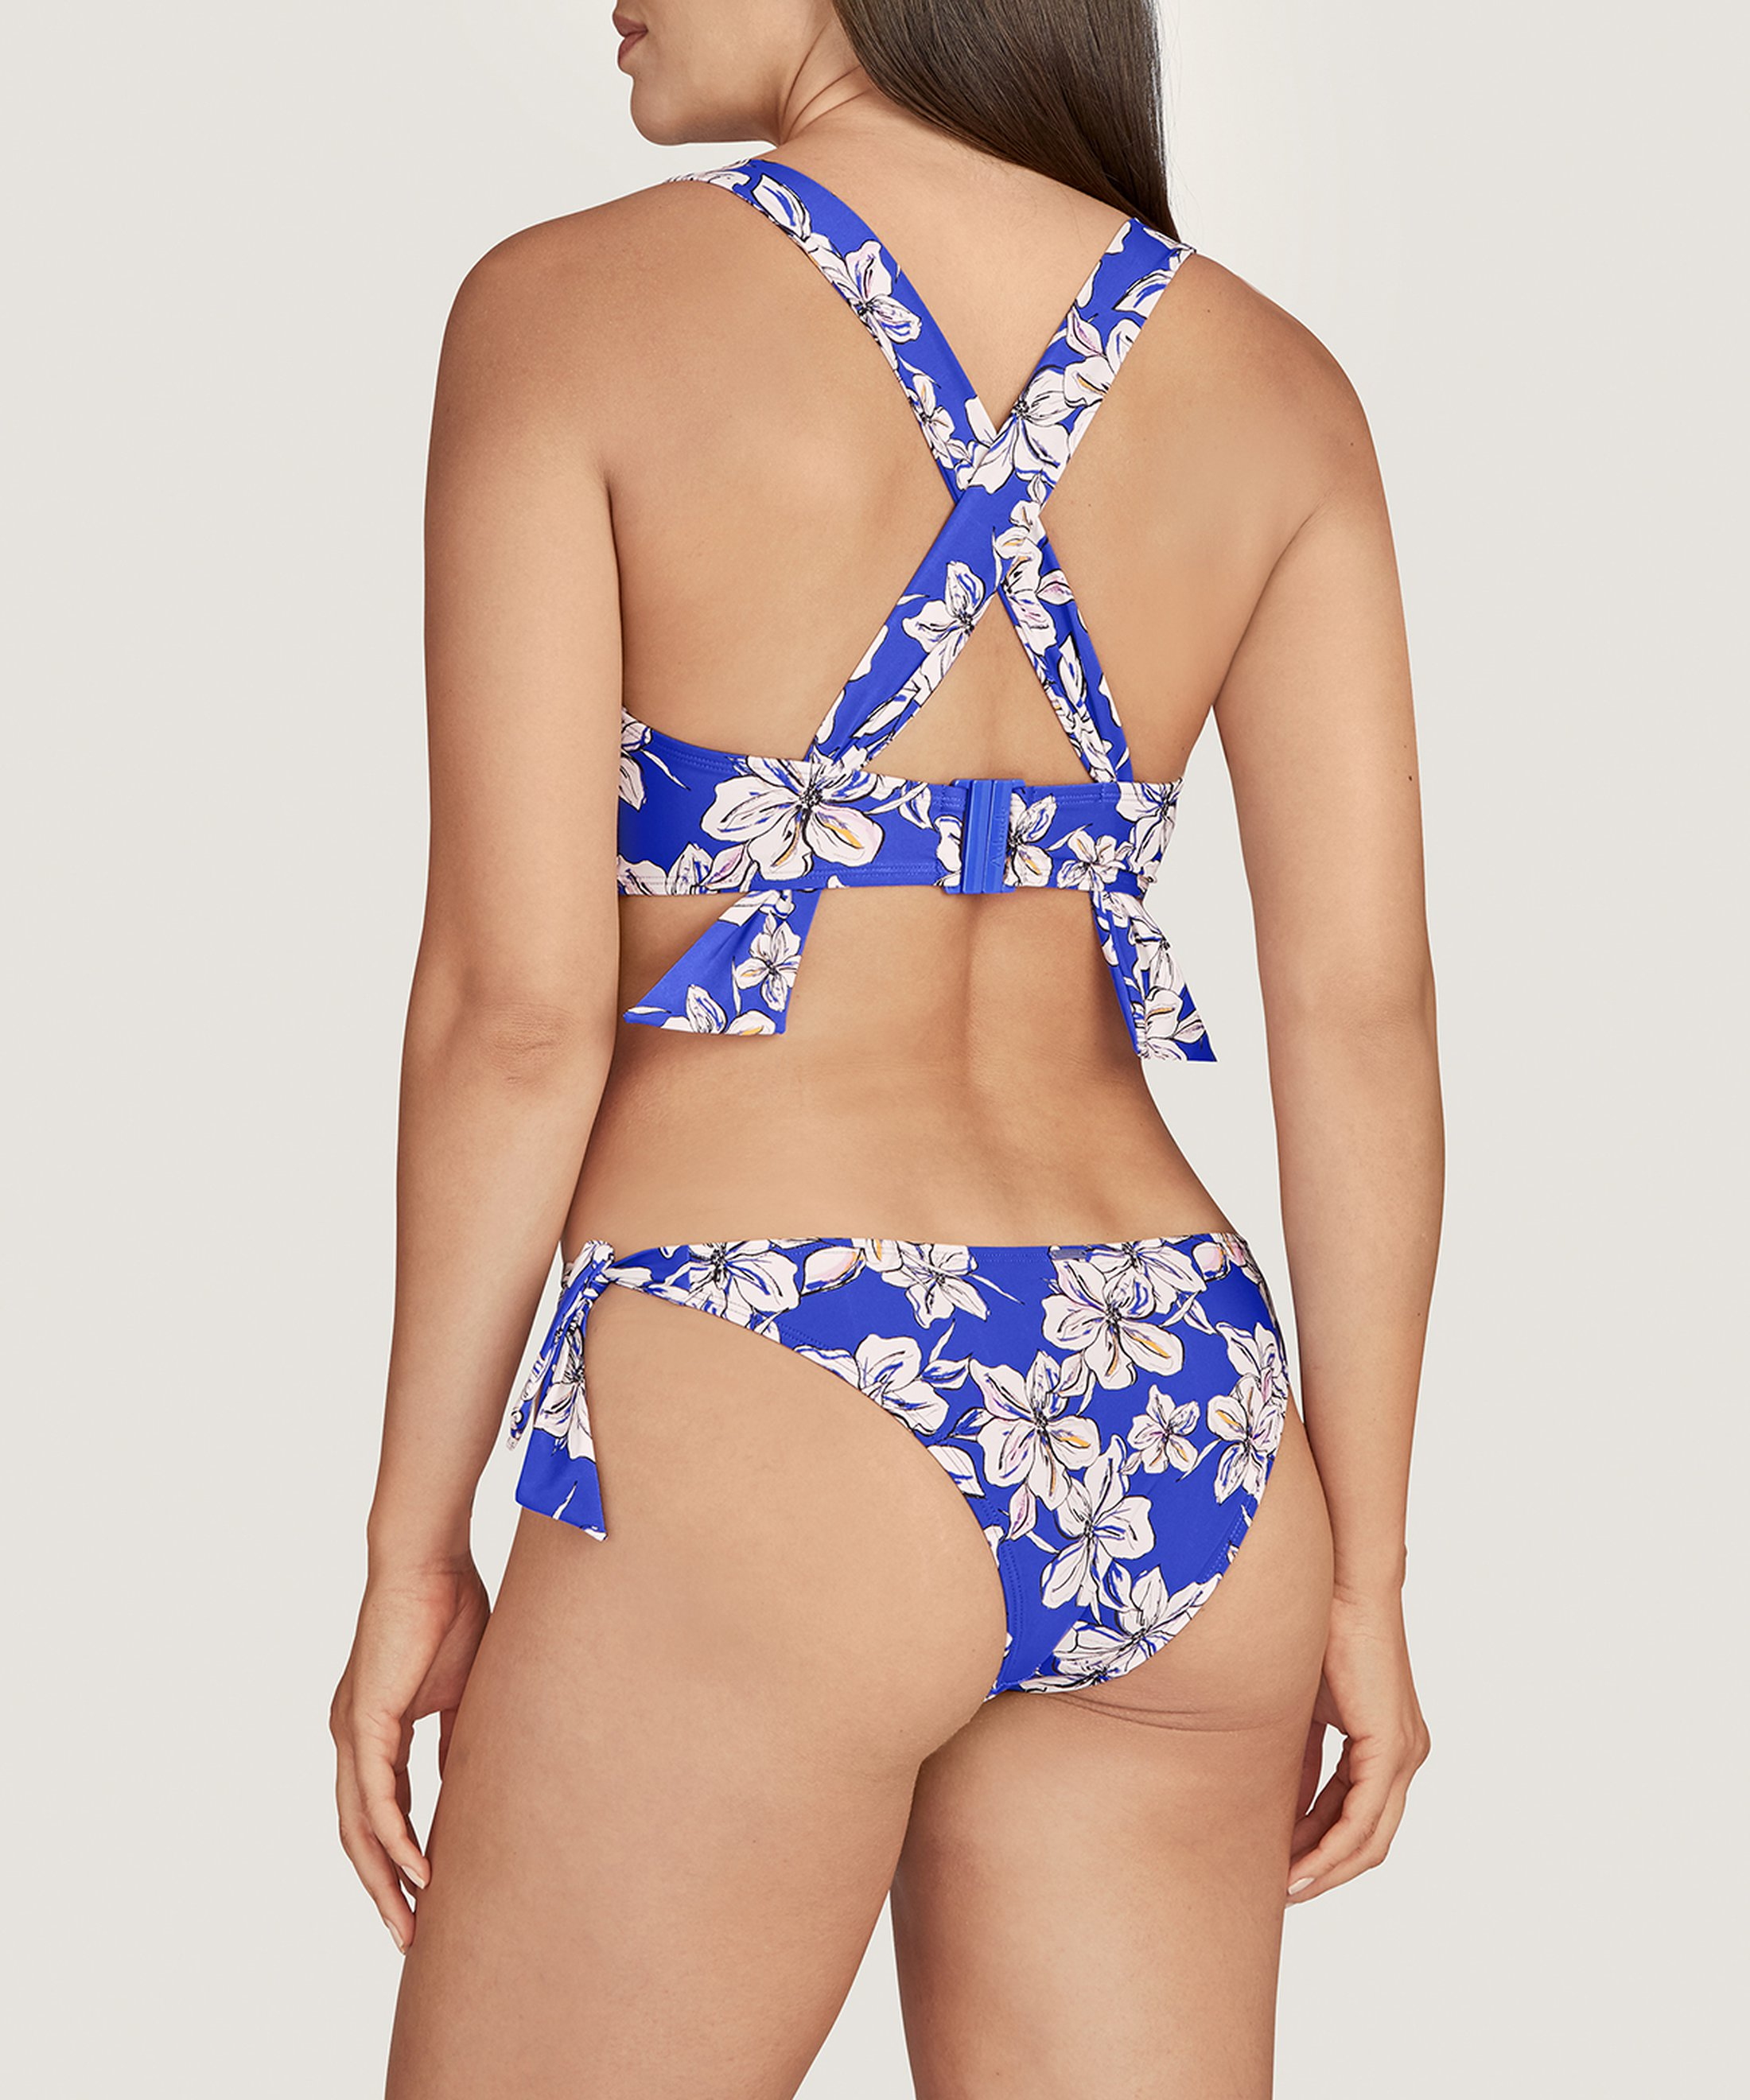 PARFUMS D'ÉTÉ Triangle bikini top Floral Glycine Blue | Aubade